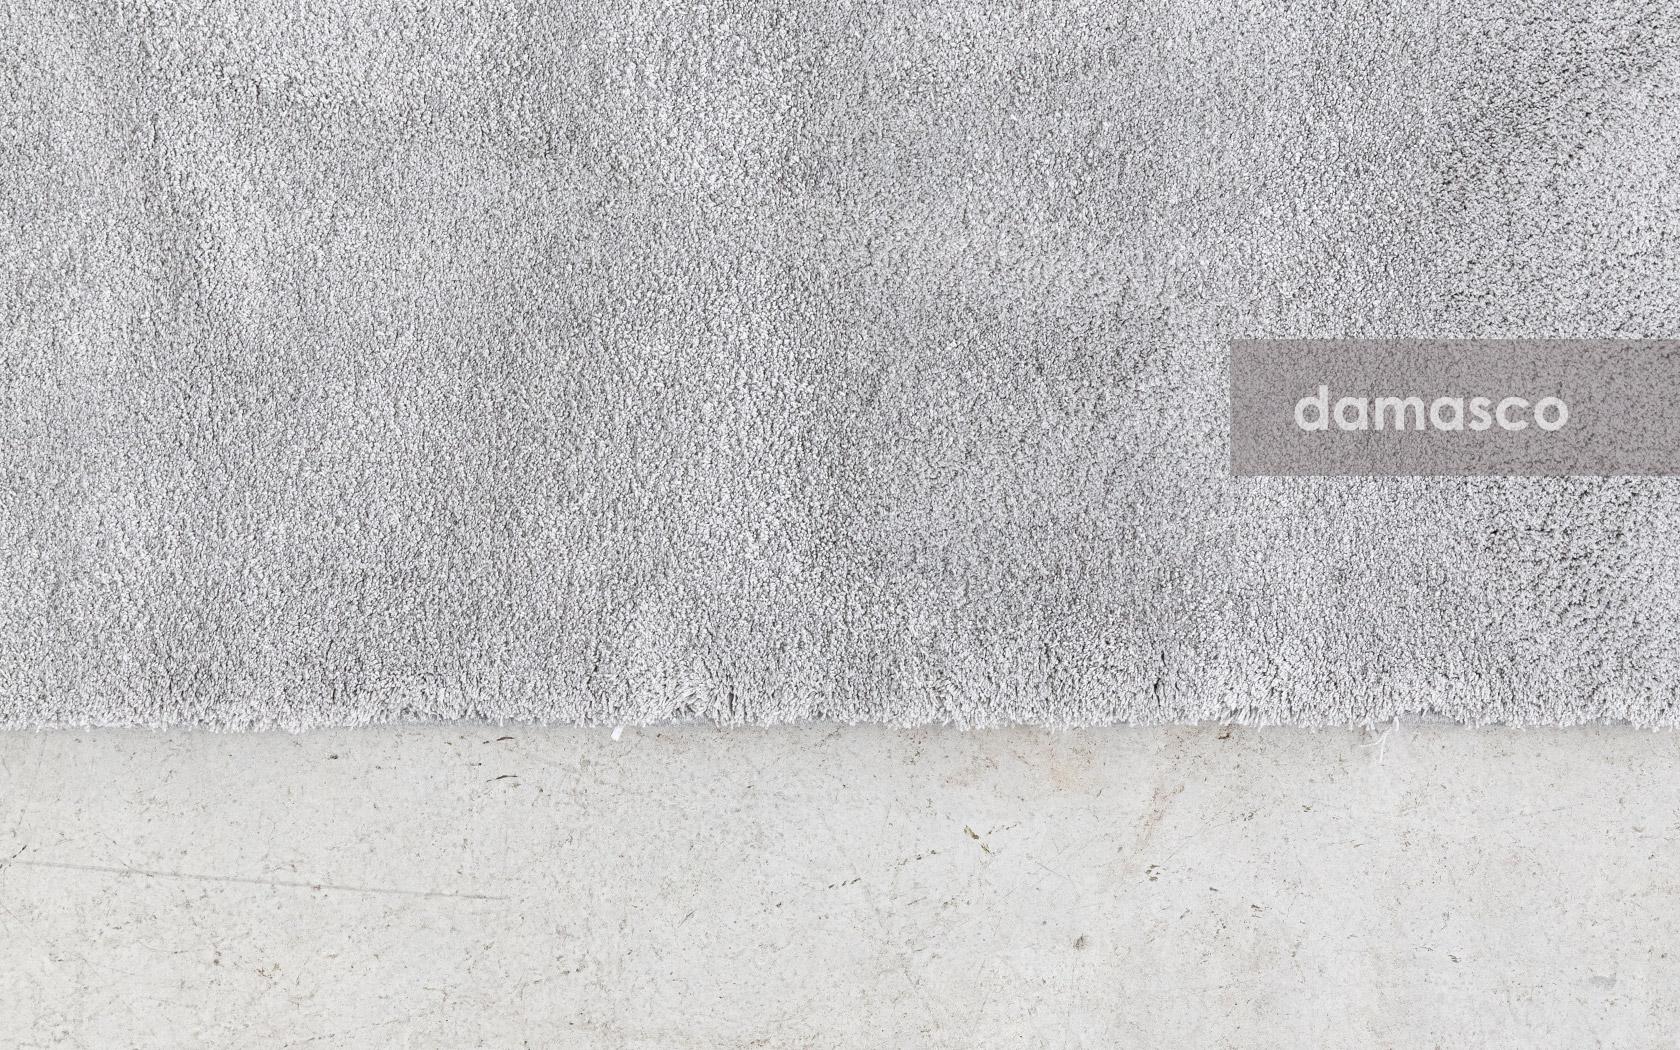 damasco-alfombra-2021-baja-16